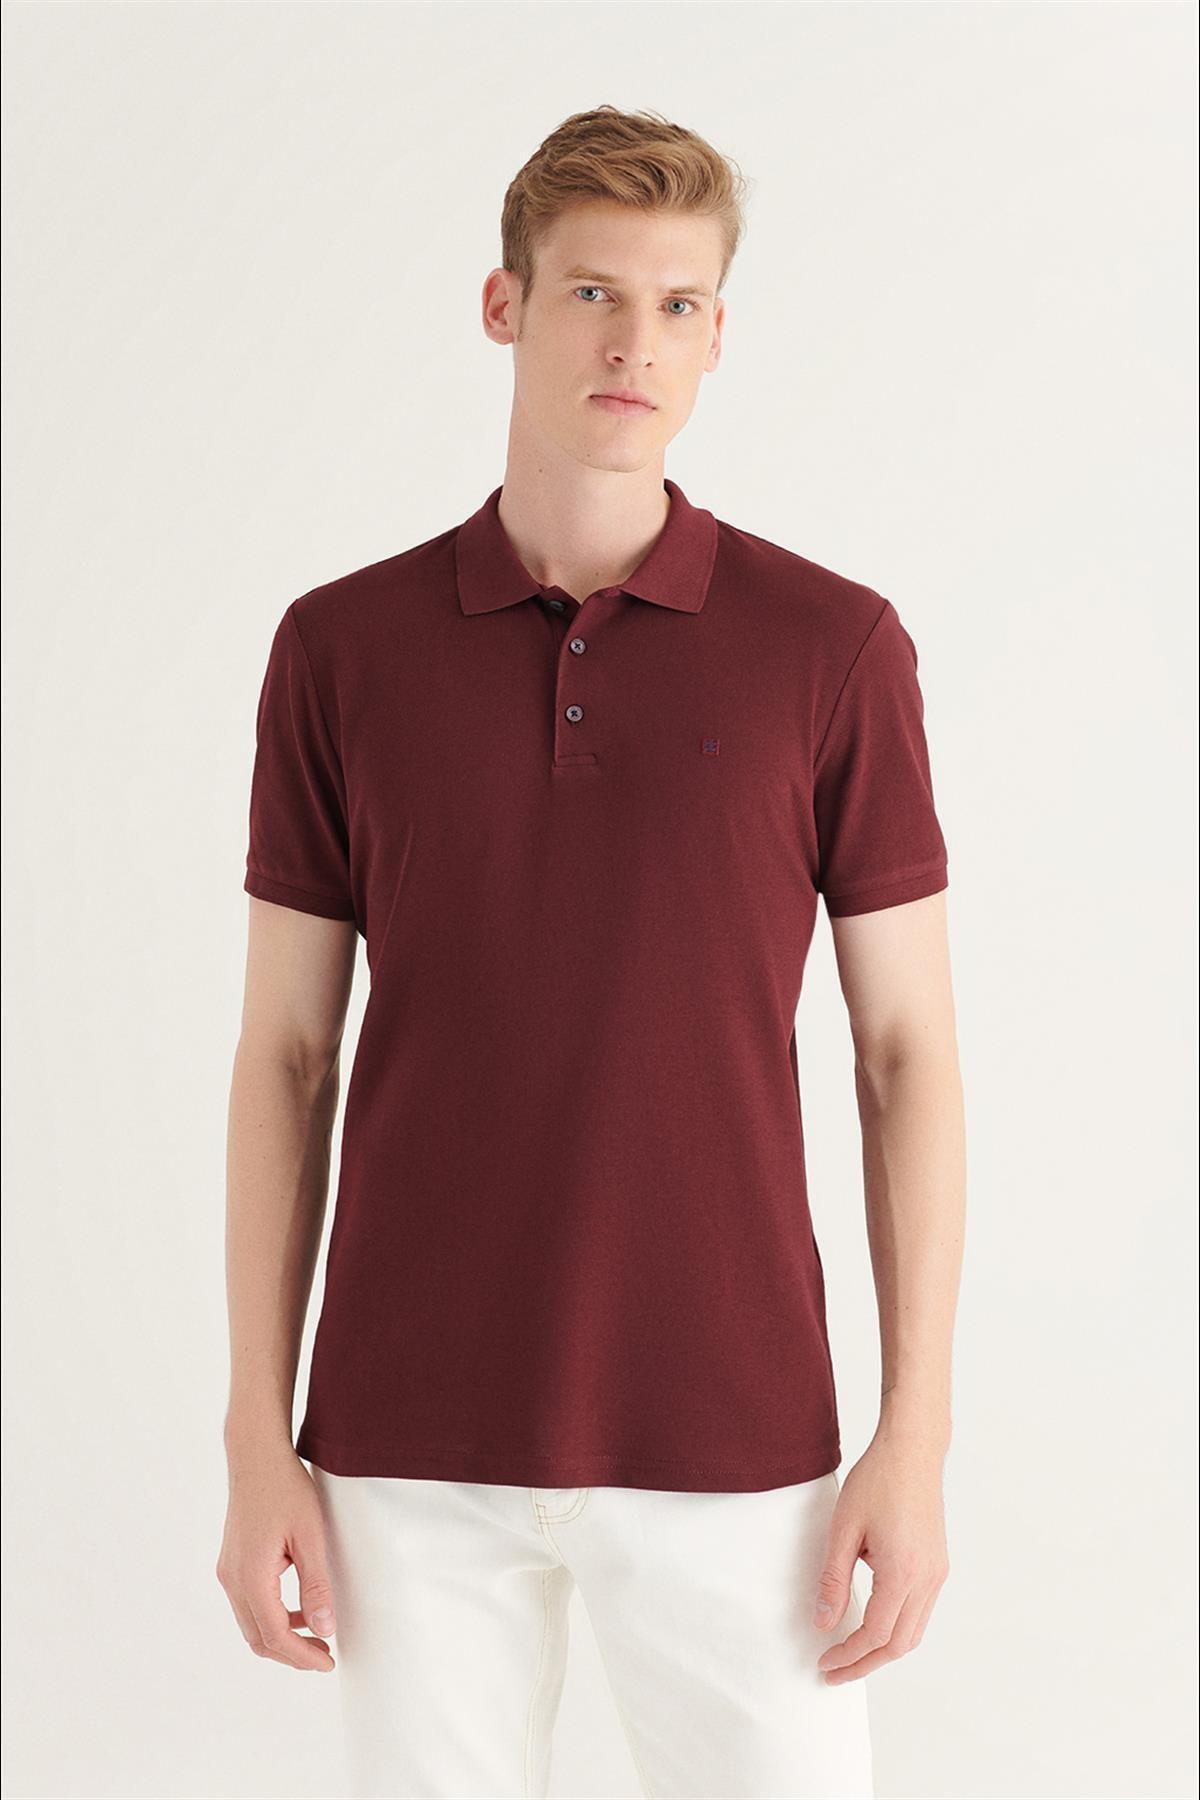 Erkek Koyu Bordo Polo Yaka Düz T-shirt E001004